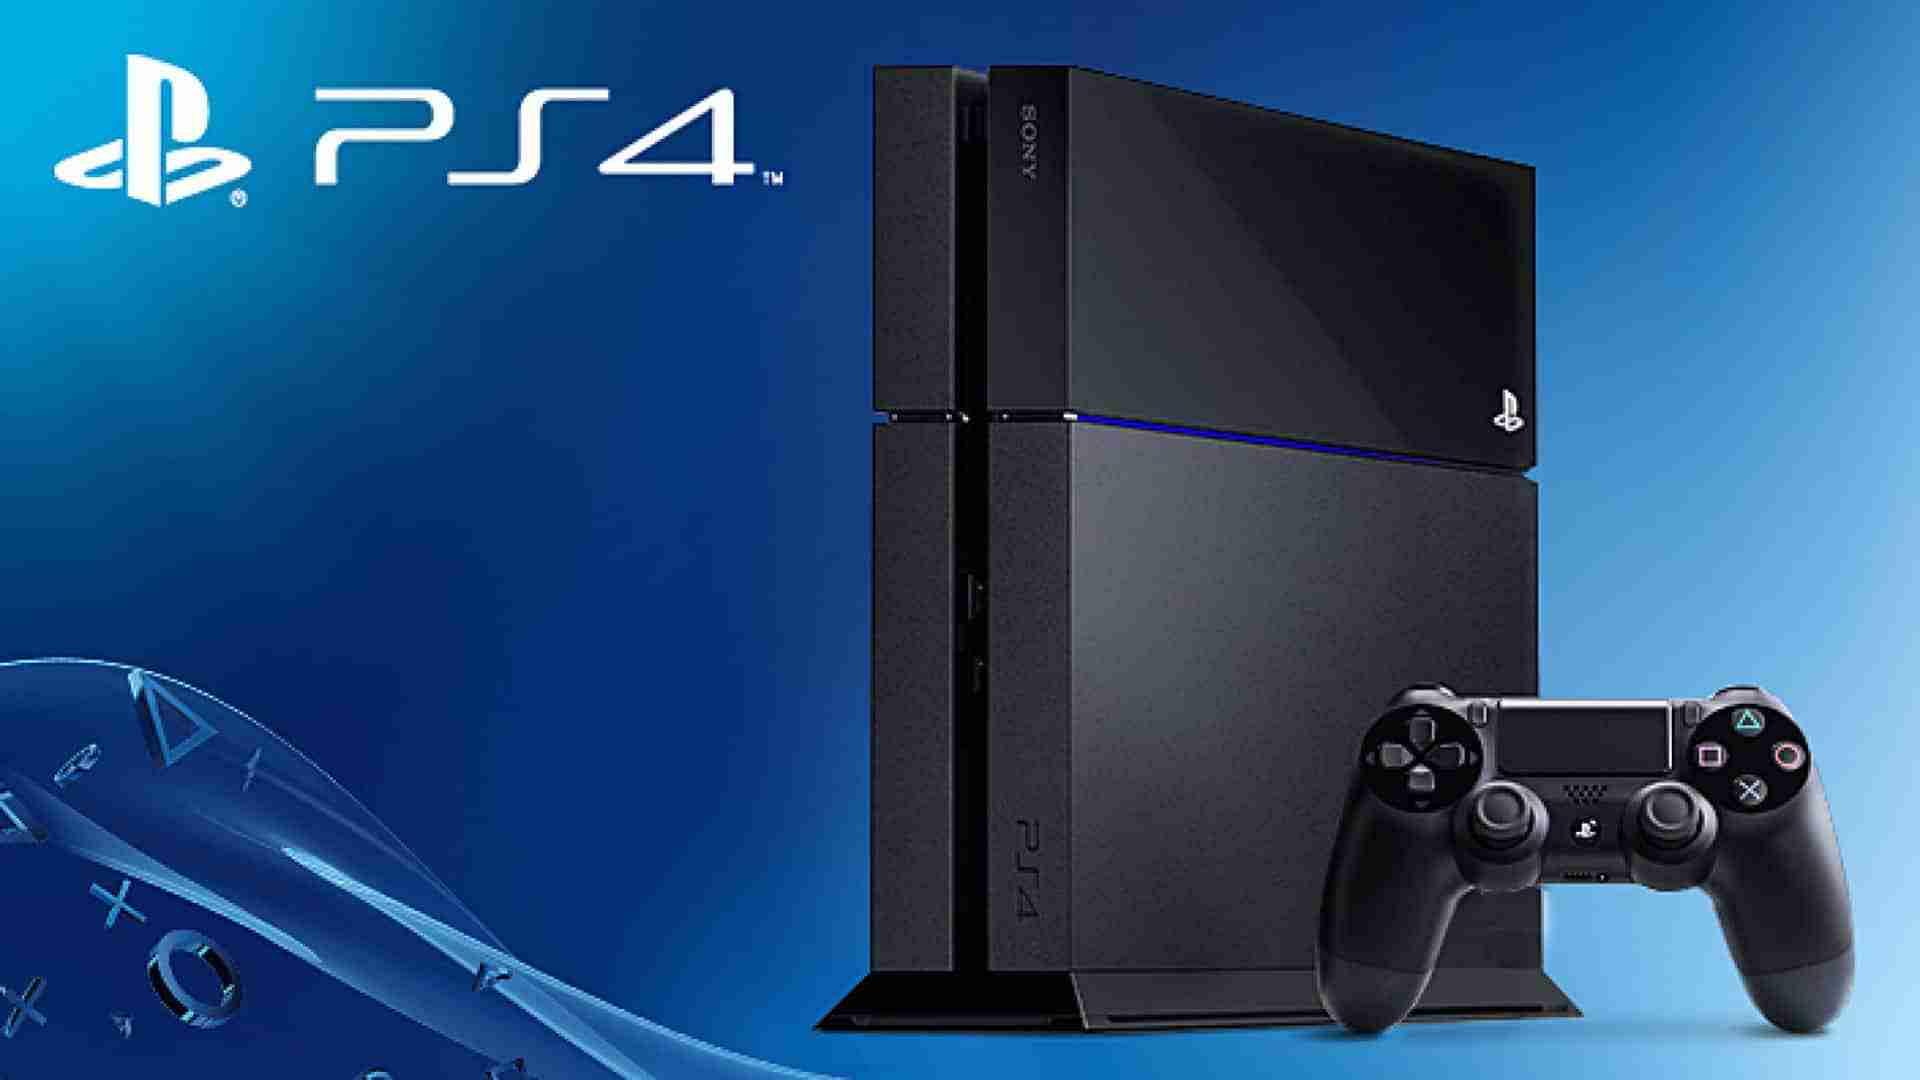 4 ps4 fat slim hdd 500gb / 1tb hen 6.72 / 7.02 / 7.55 full game pes 2021. Daftar Harga PS4, PS3, PS2 Terbaru Maret 2021